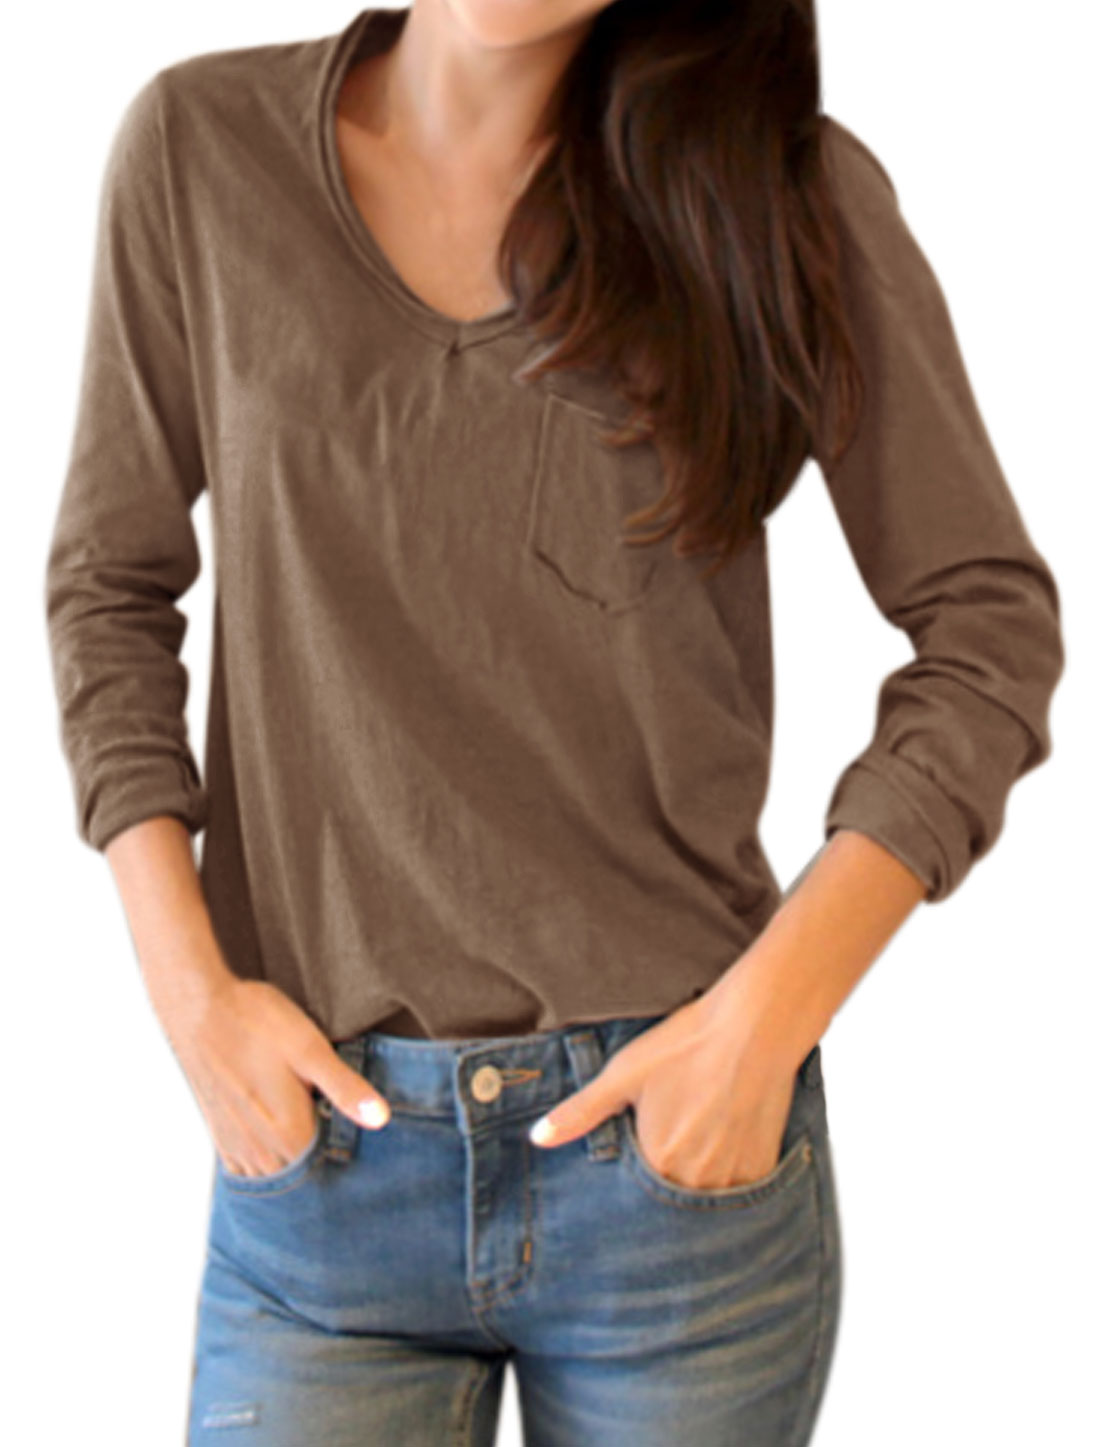 Women V Neck Long Sleeves Chest Pocket Tee Shirt Brown XS